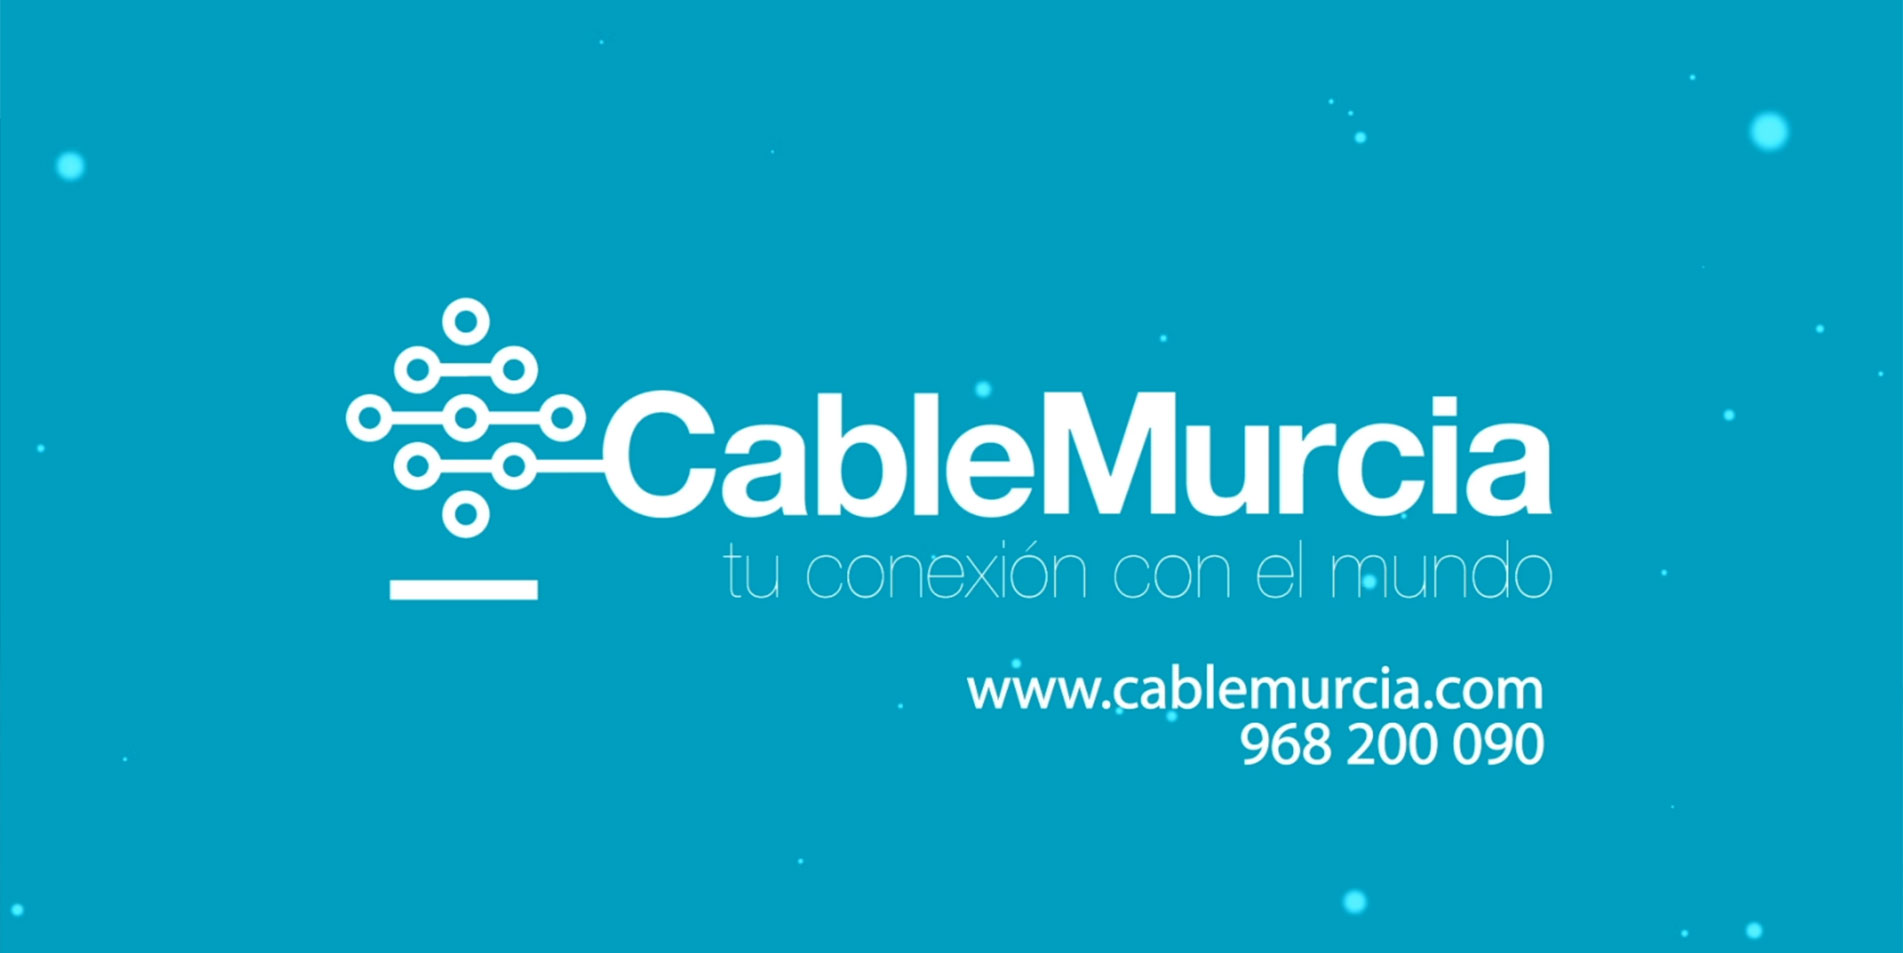 Playmark_Cablemurcia